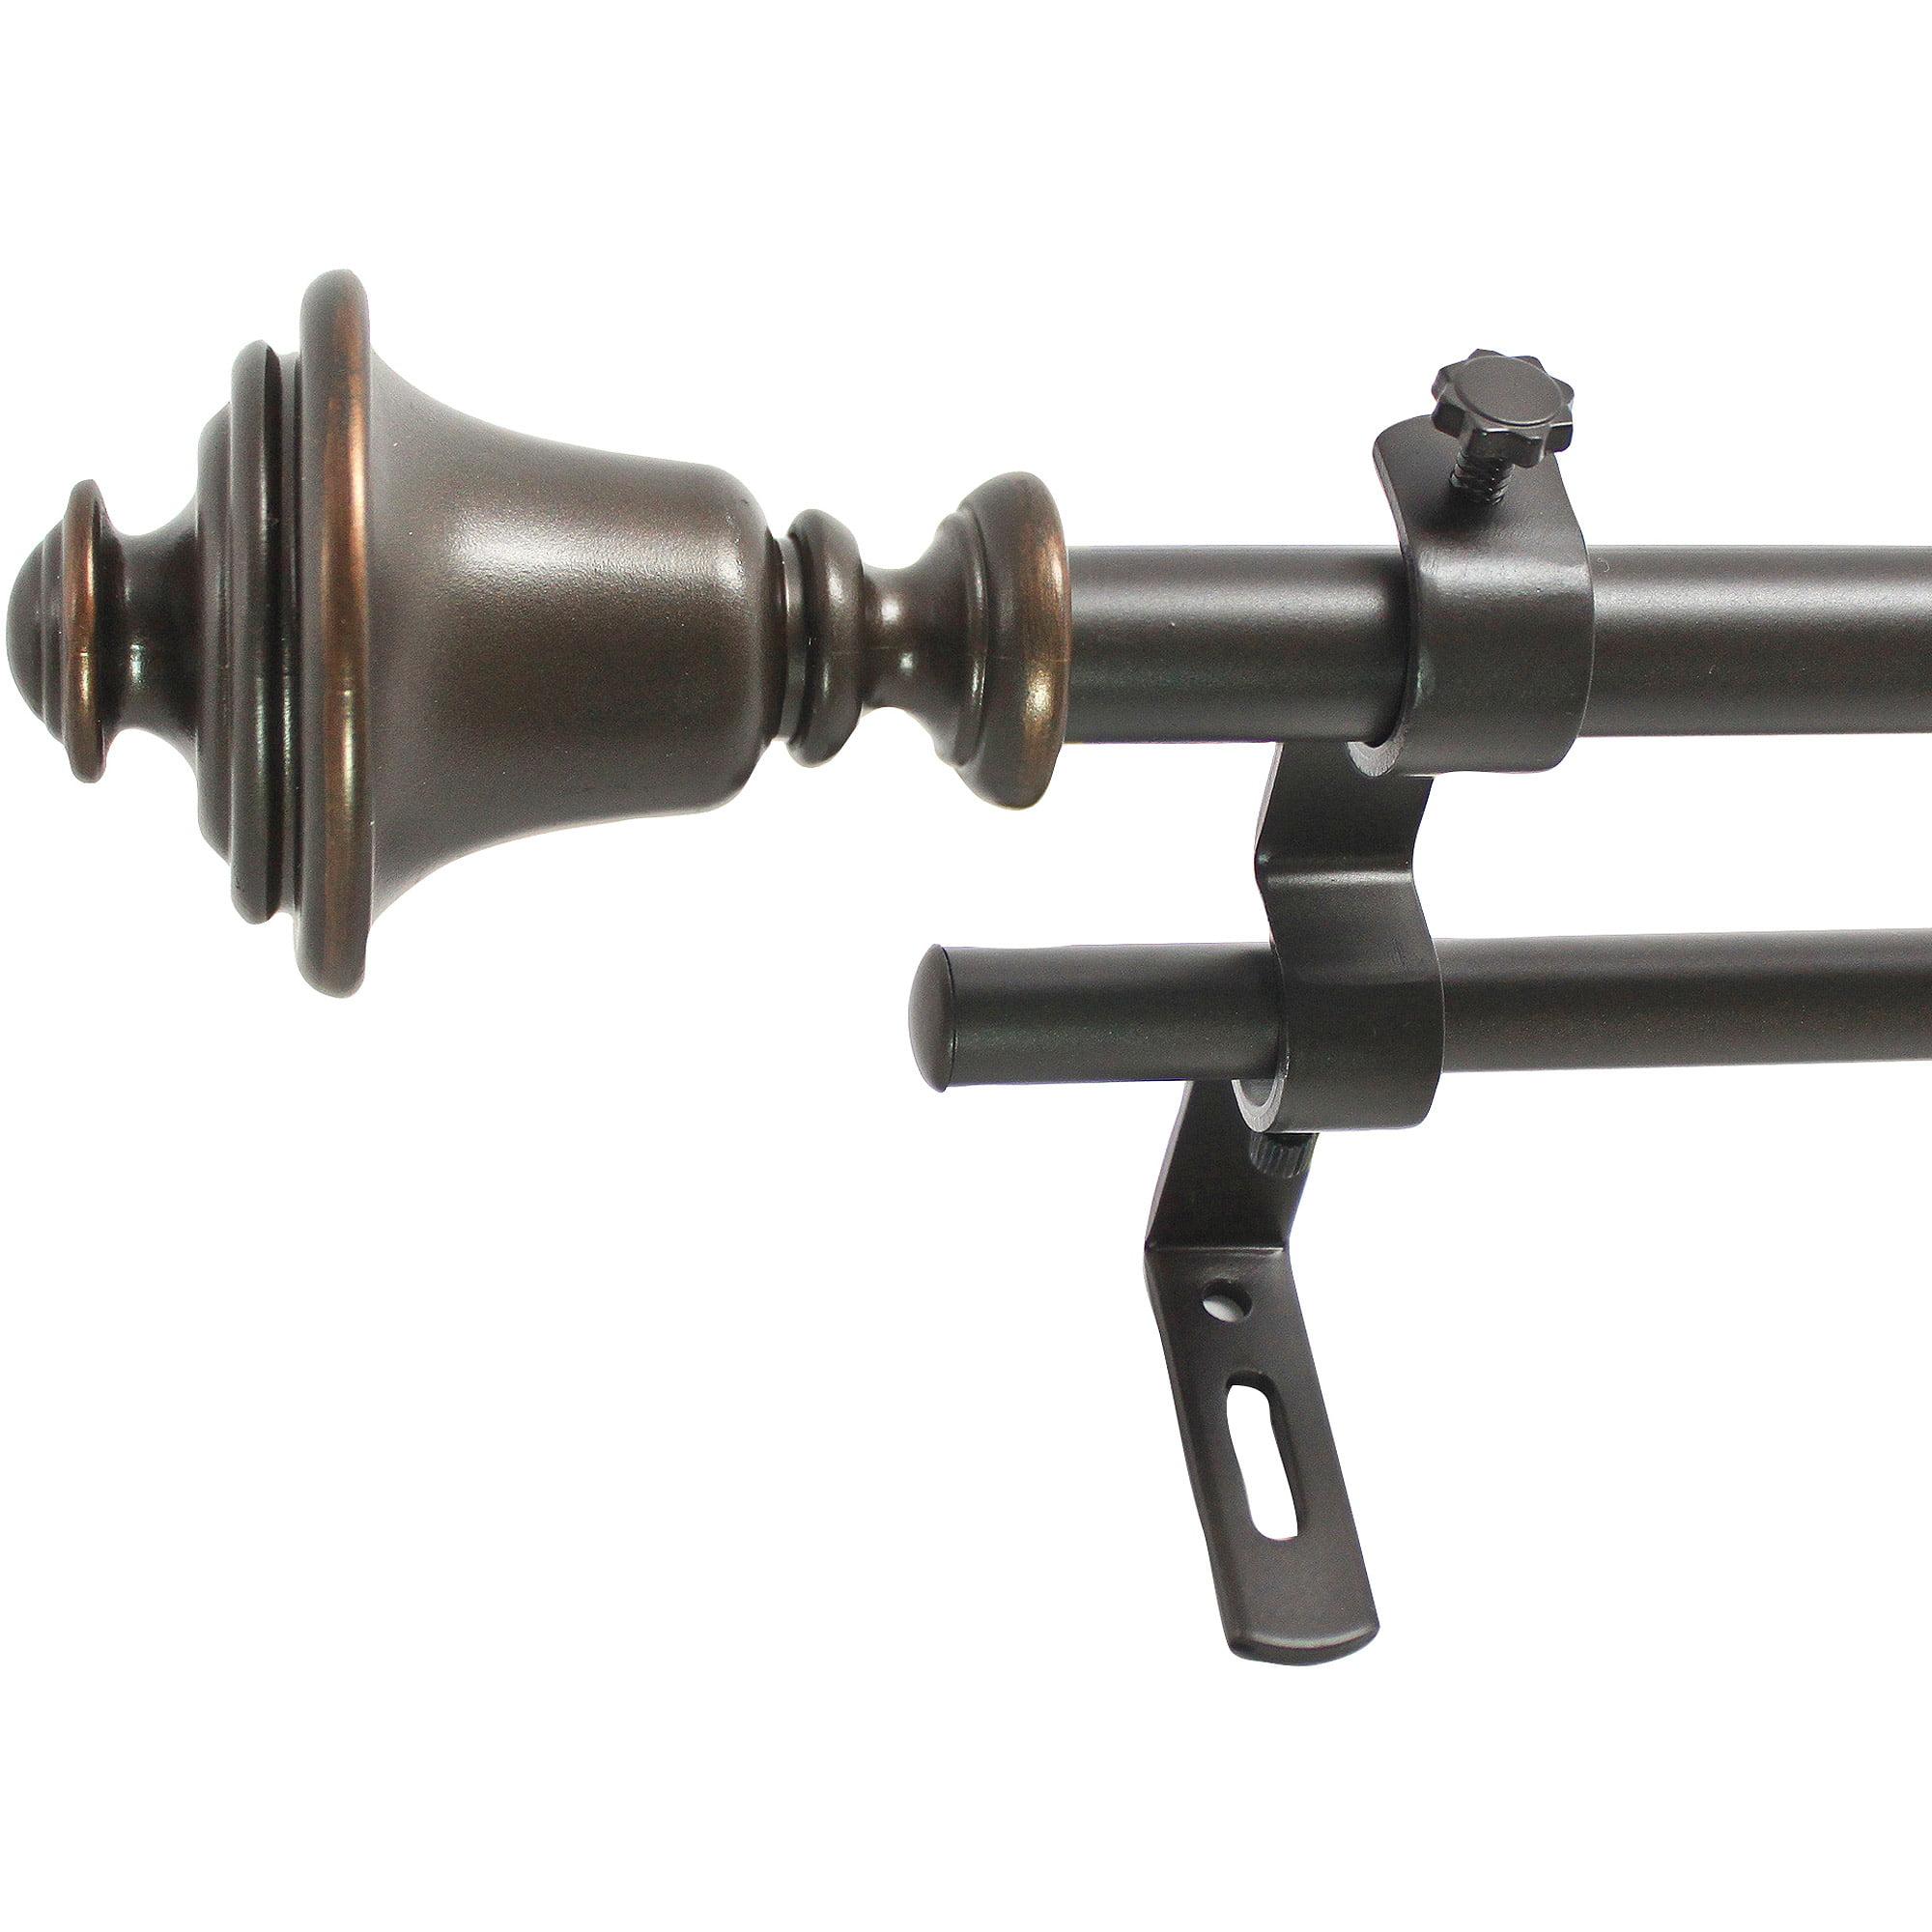 "Montevilla 5/8"" Bell Double Drapery Rod Set"